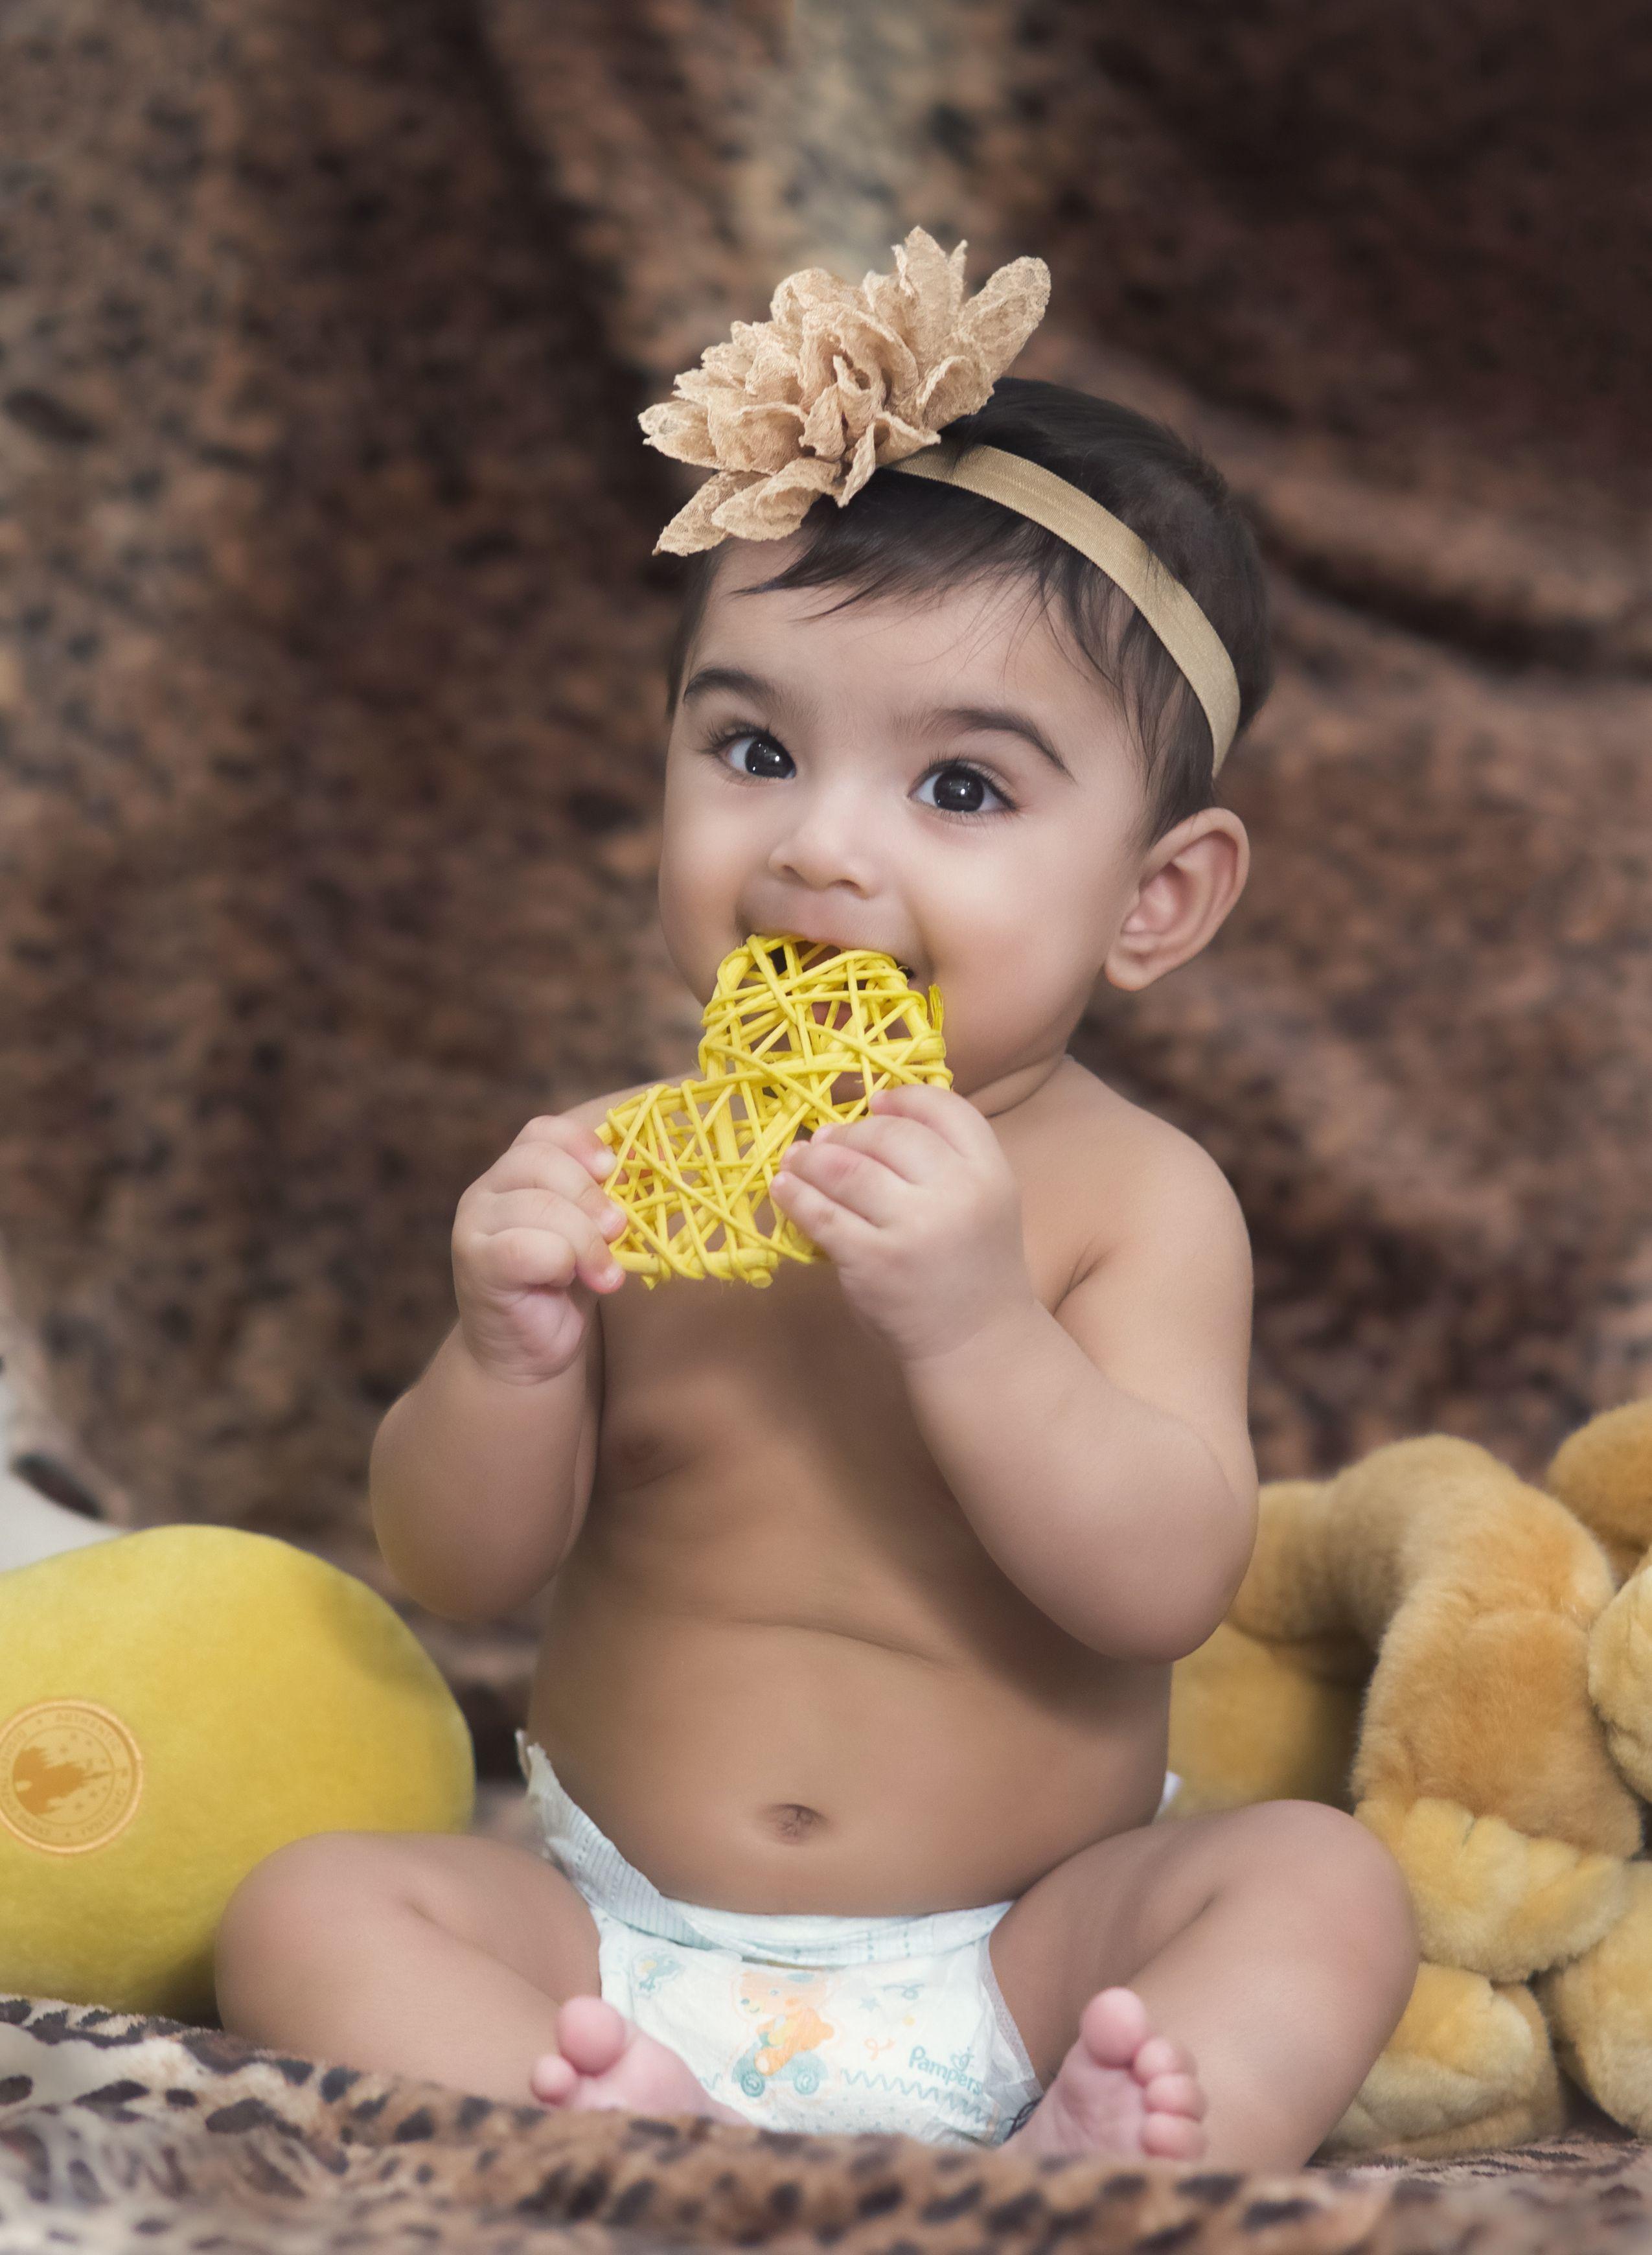 Top photographers hyderabad photographing babies goa mumbai children photography bombay